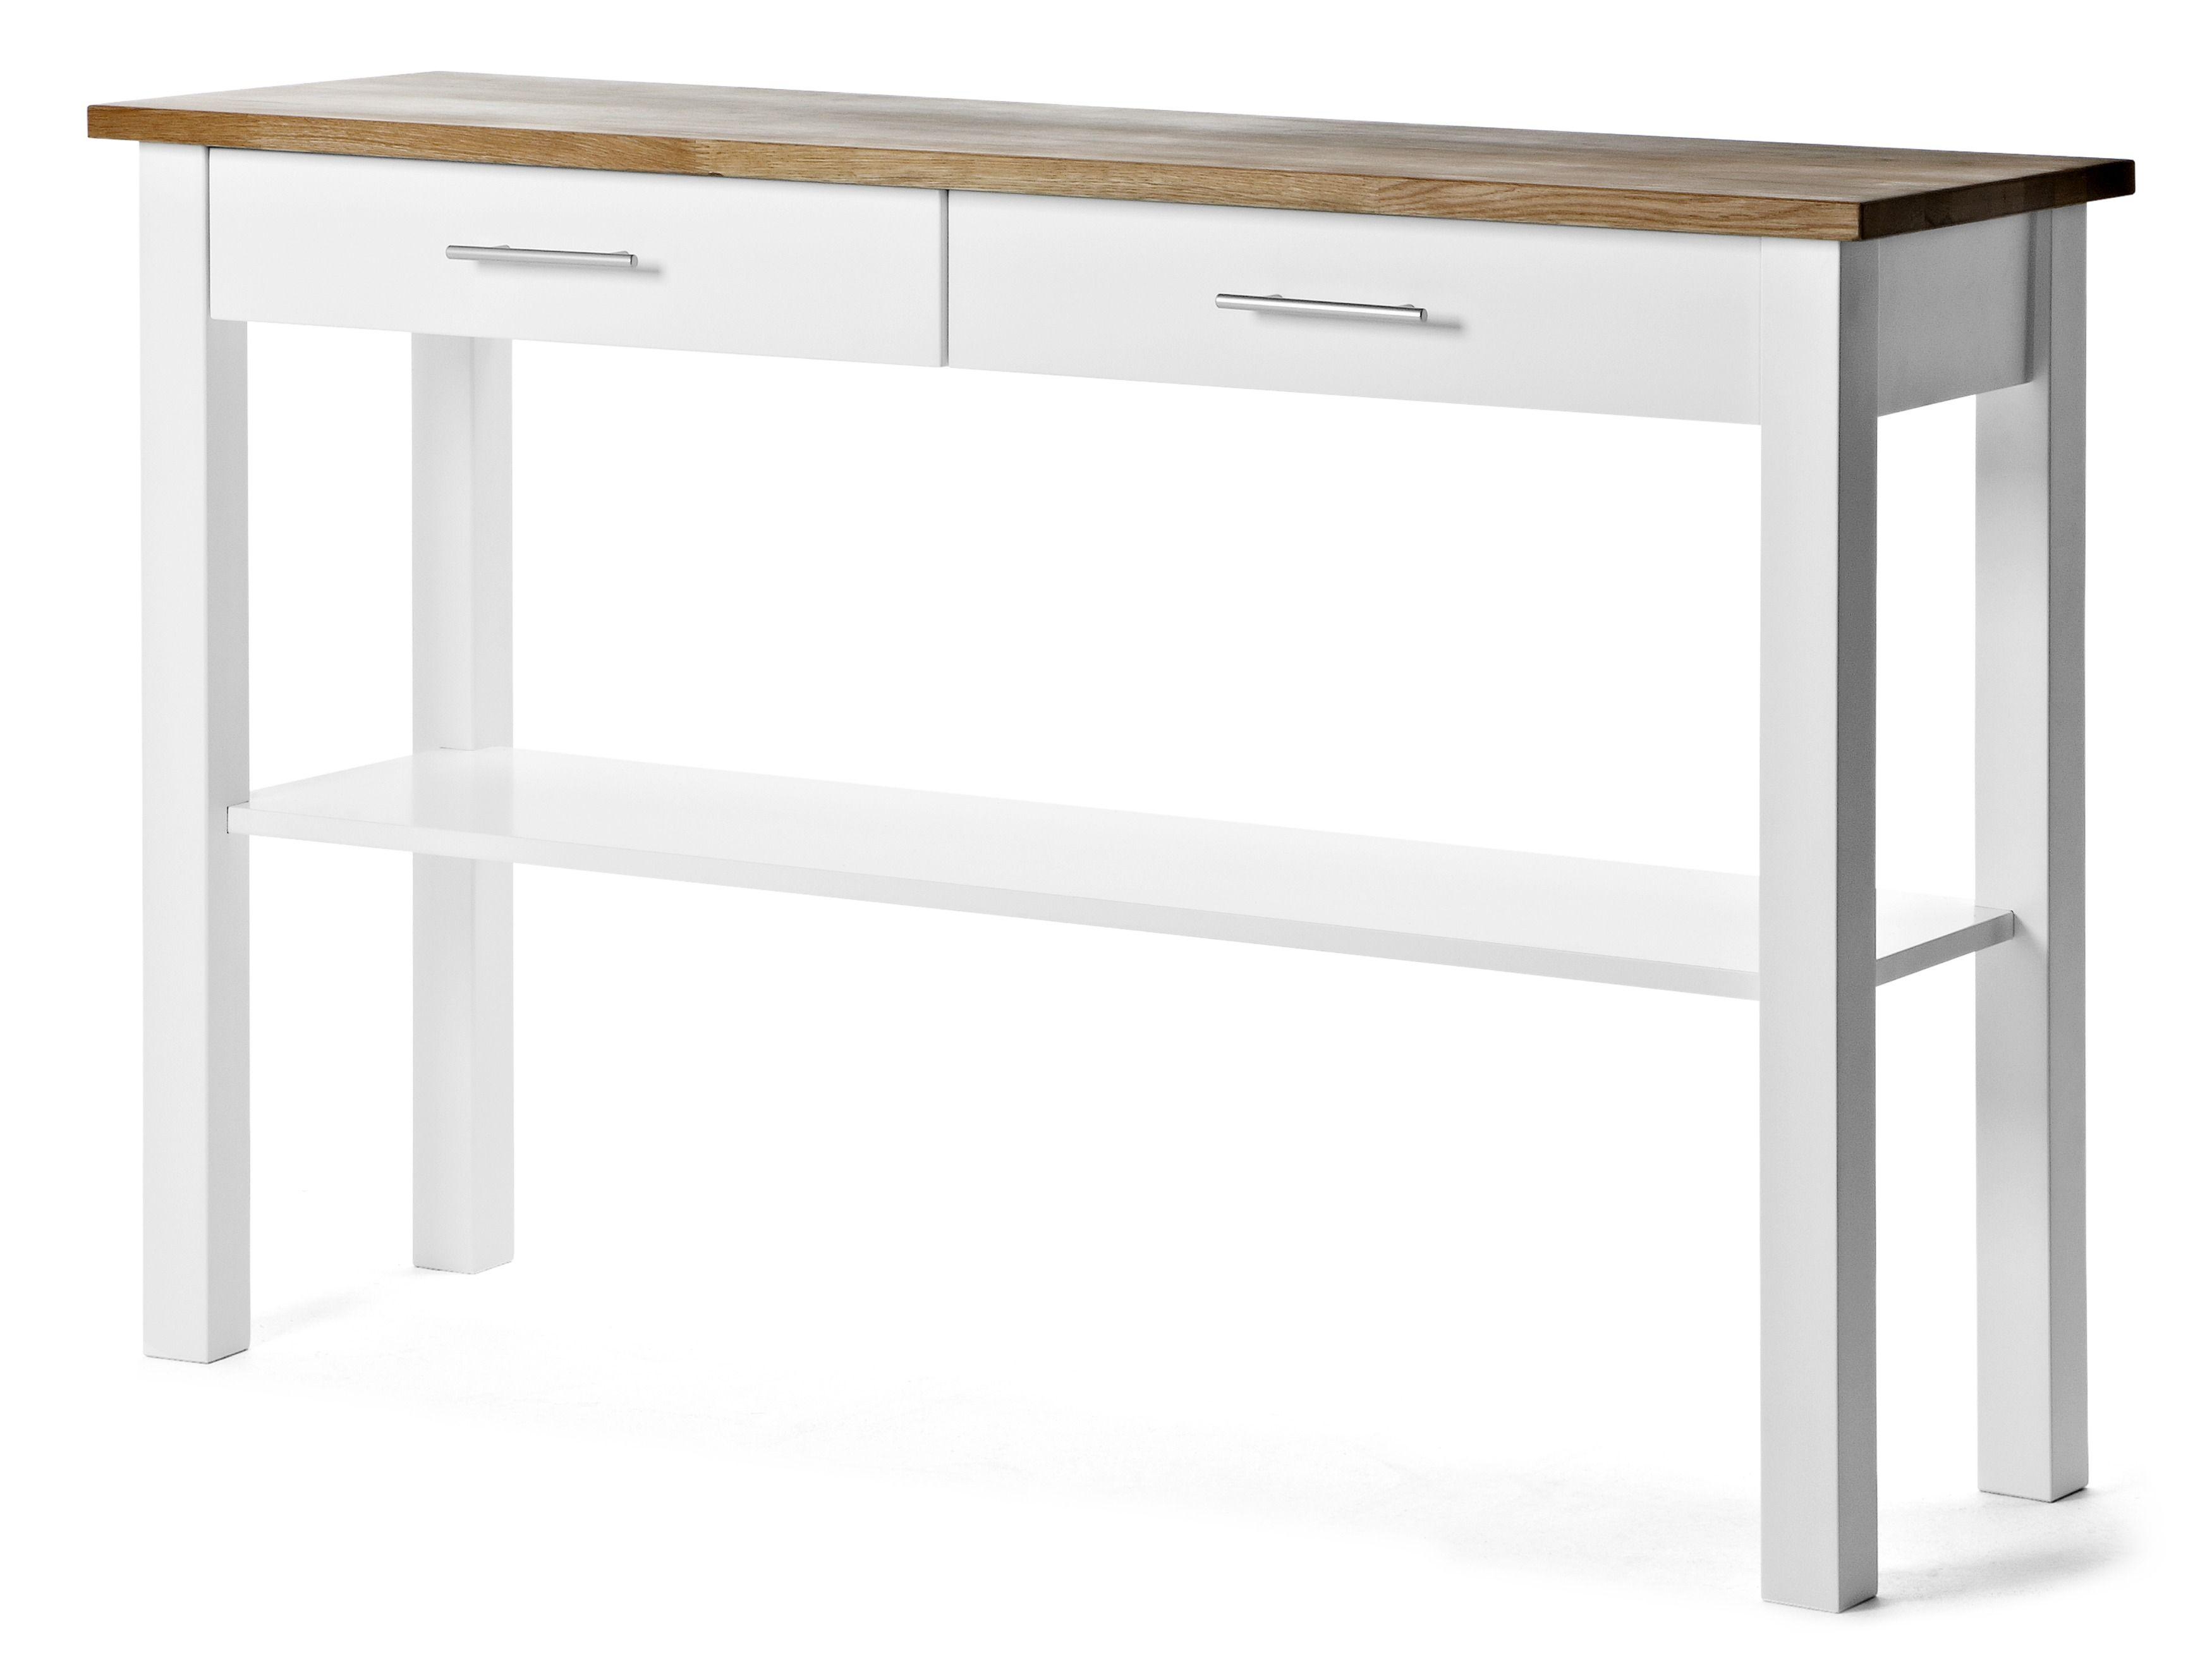 Toppen Dalarö avlastningsbord har en diskret skandinavisk charm med GH-69